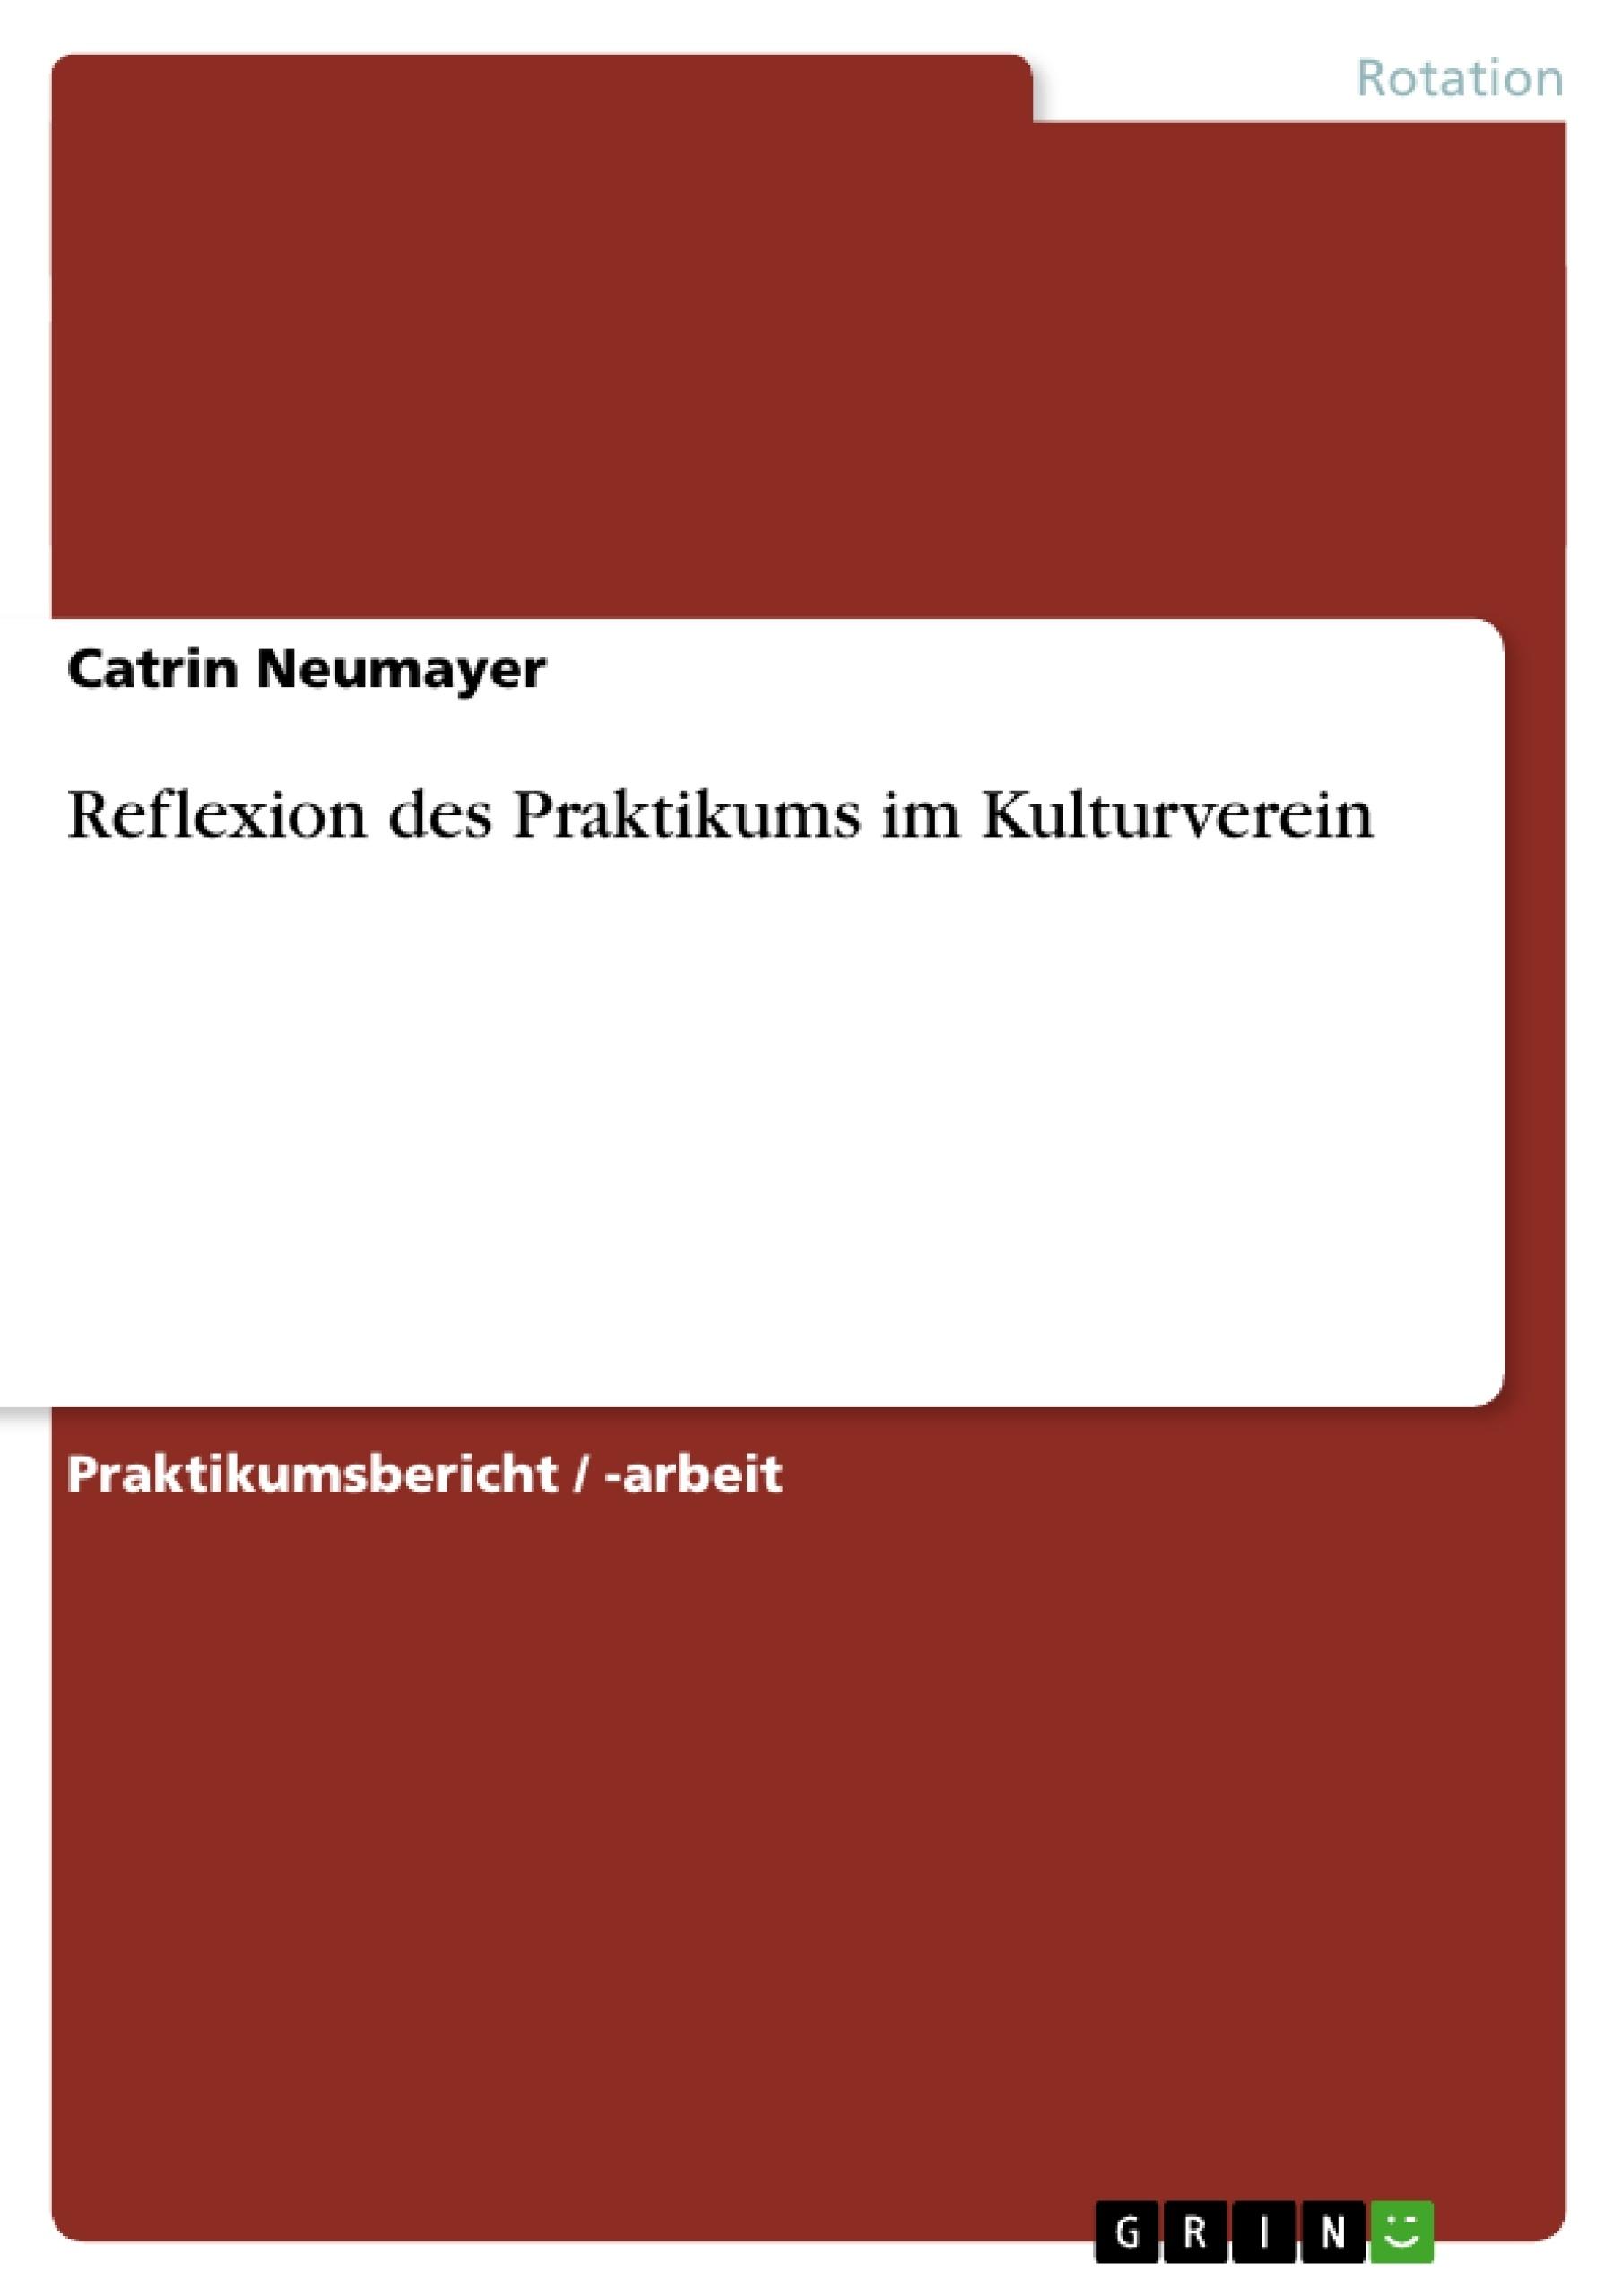 Titel: Reflexion des Praktikums im Kulturverein